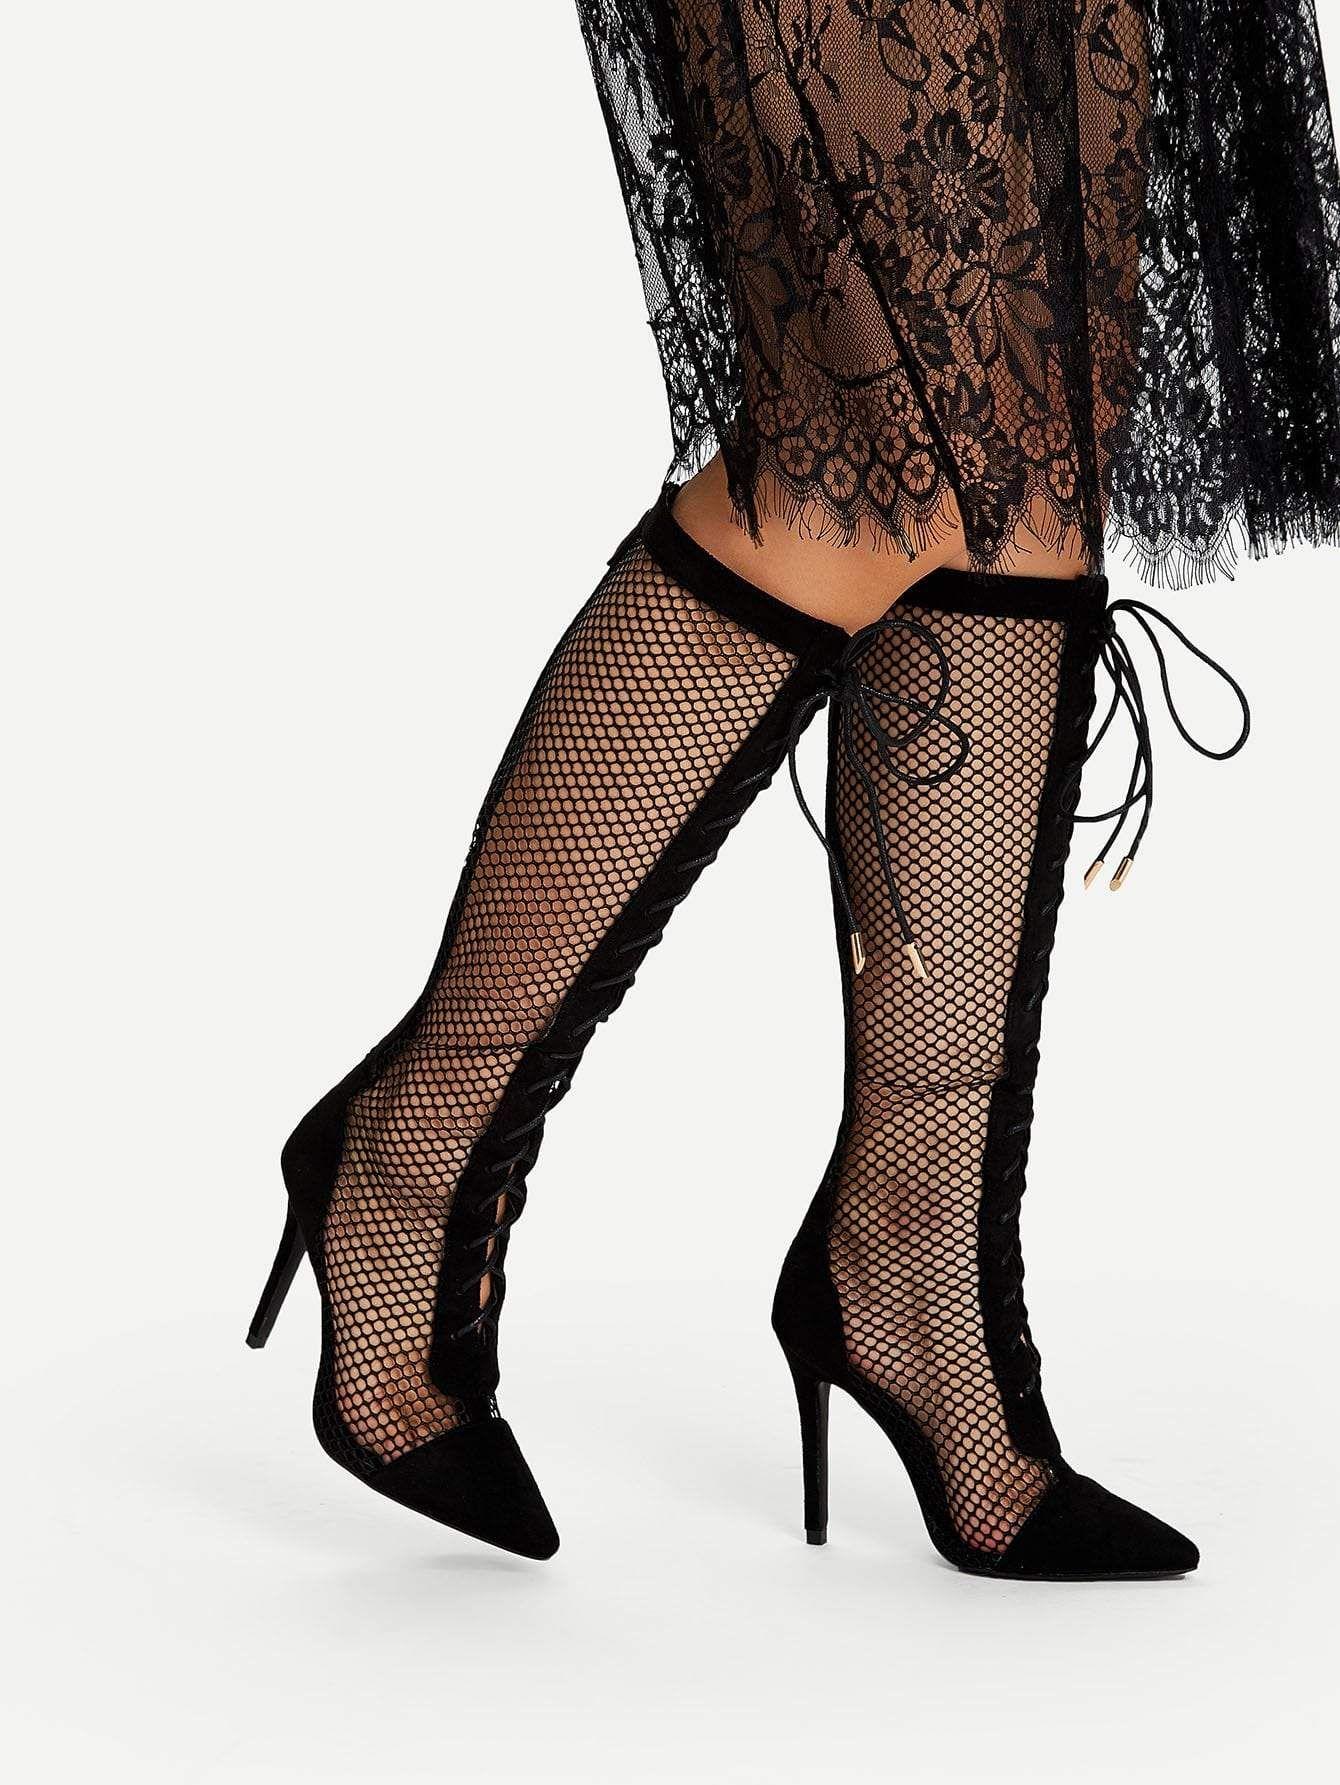 e9f2a47a5d0 lace up fishnet knee high boots. #boots #shoes #women #fashion ...